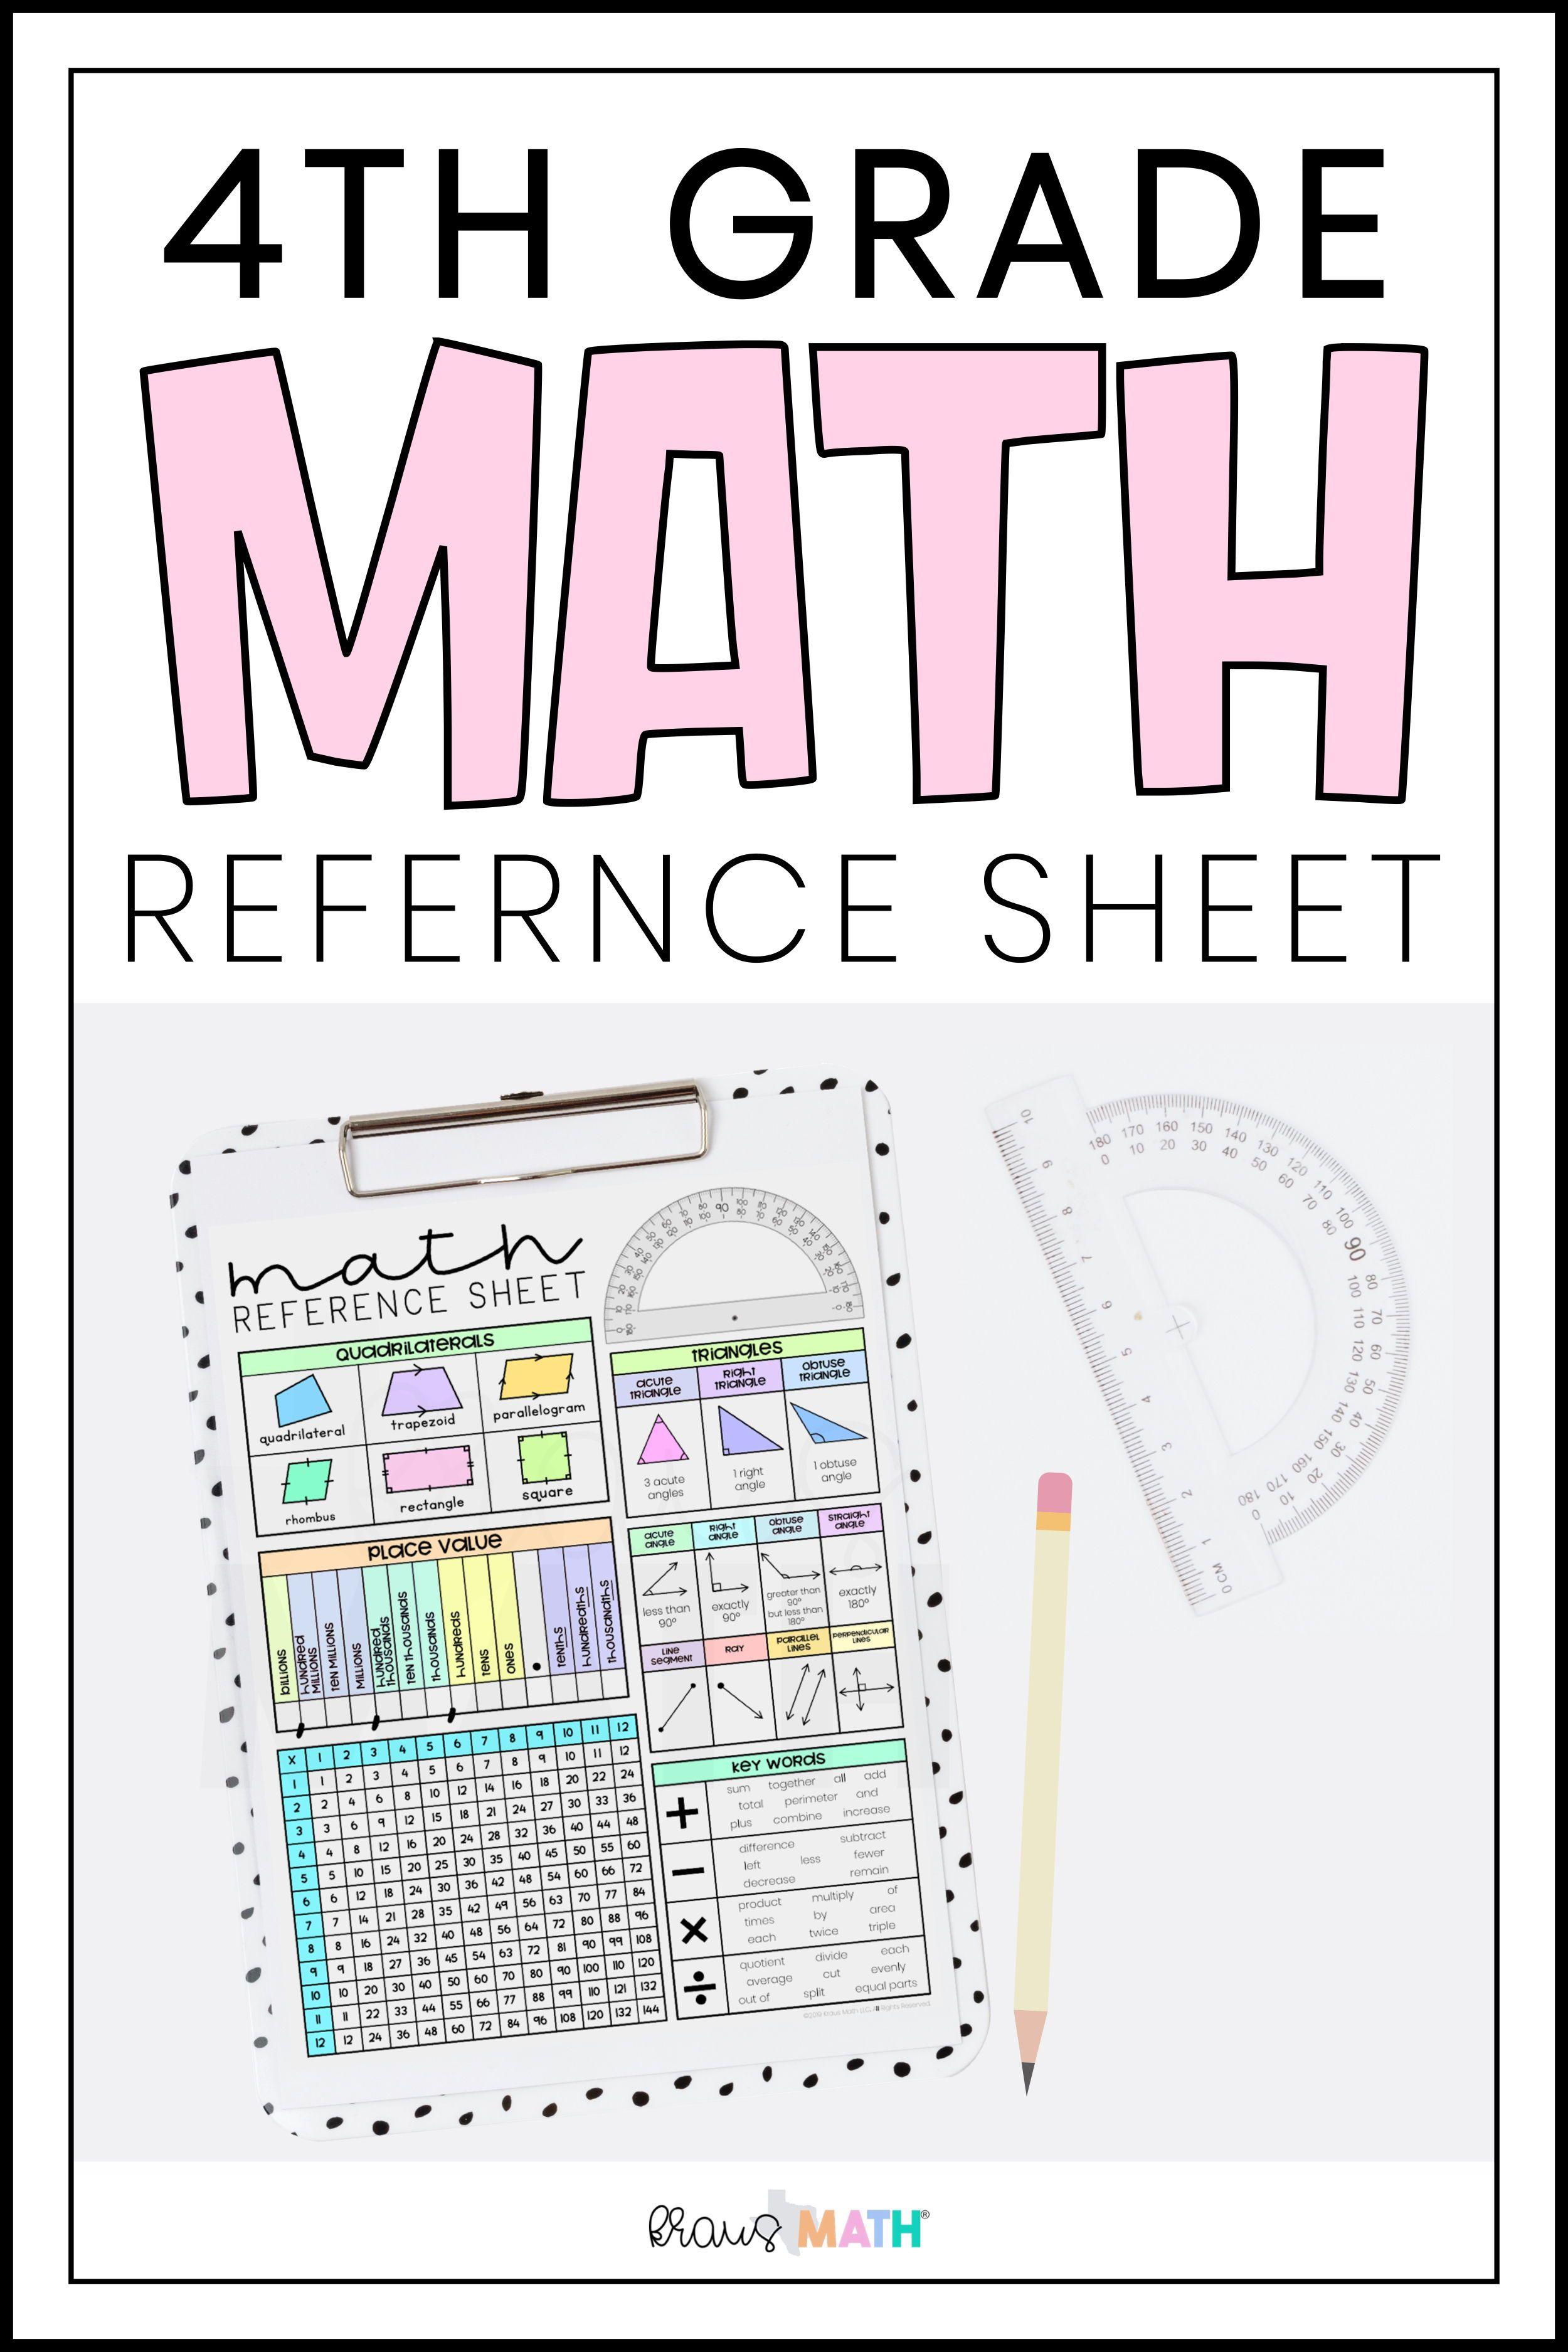 4th Grade Math Reference Sheet